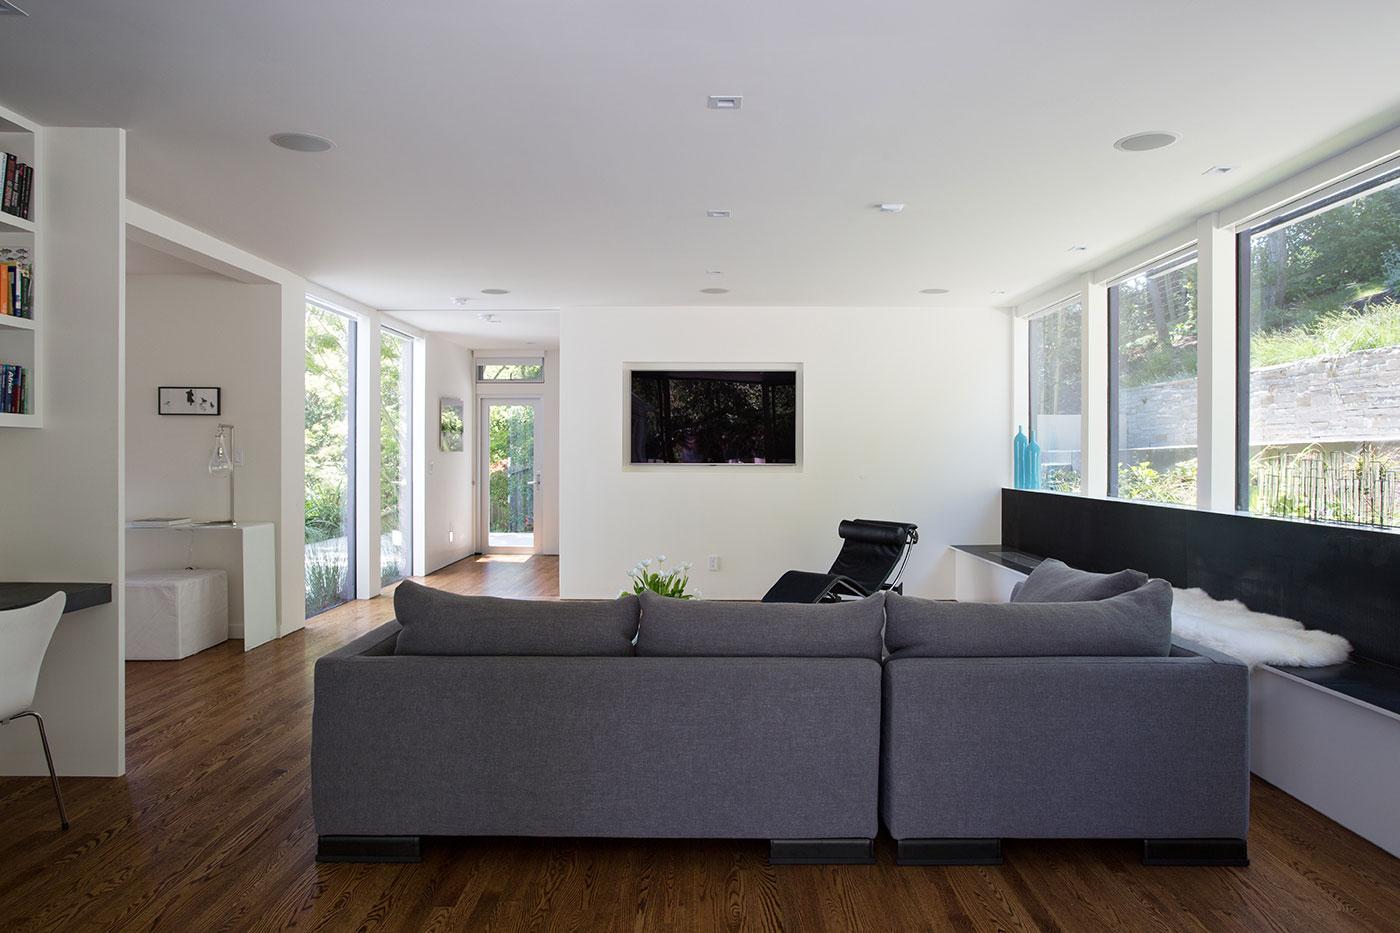 Minimal Modern Addition Home with Dark Grey Stuccoed Walls by Klopf Architecture-07